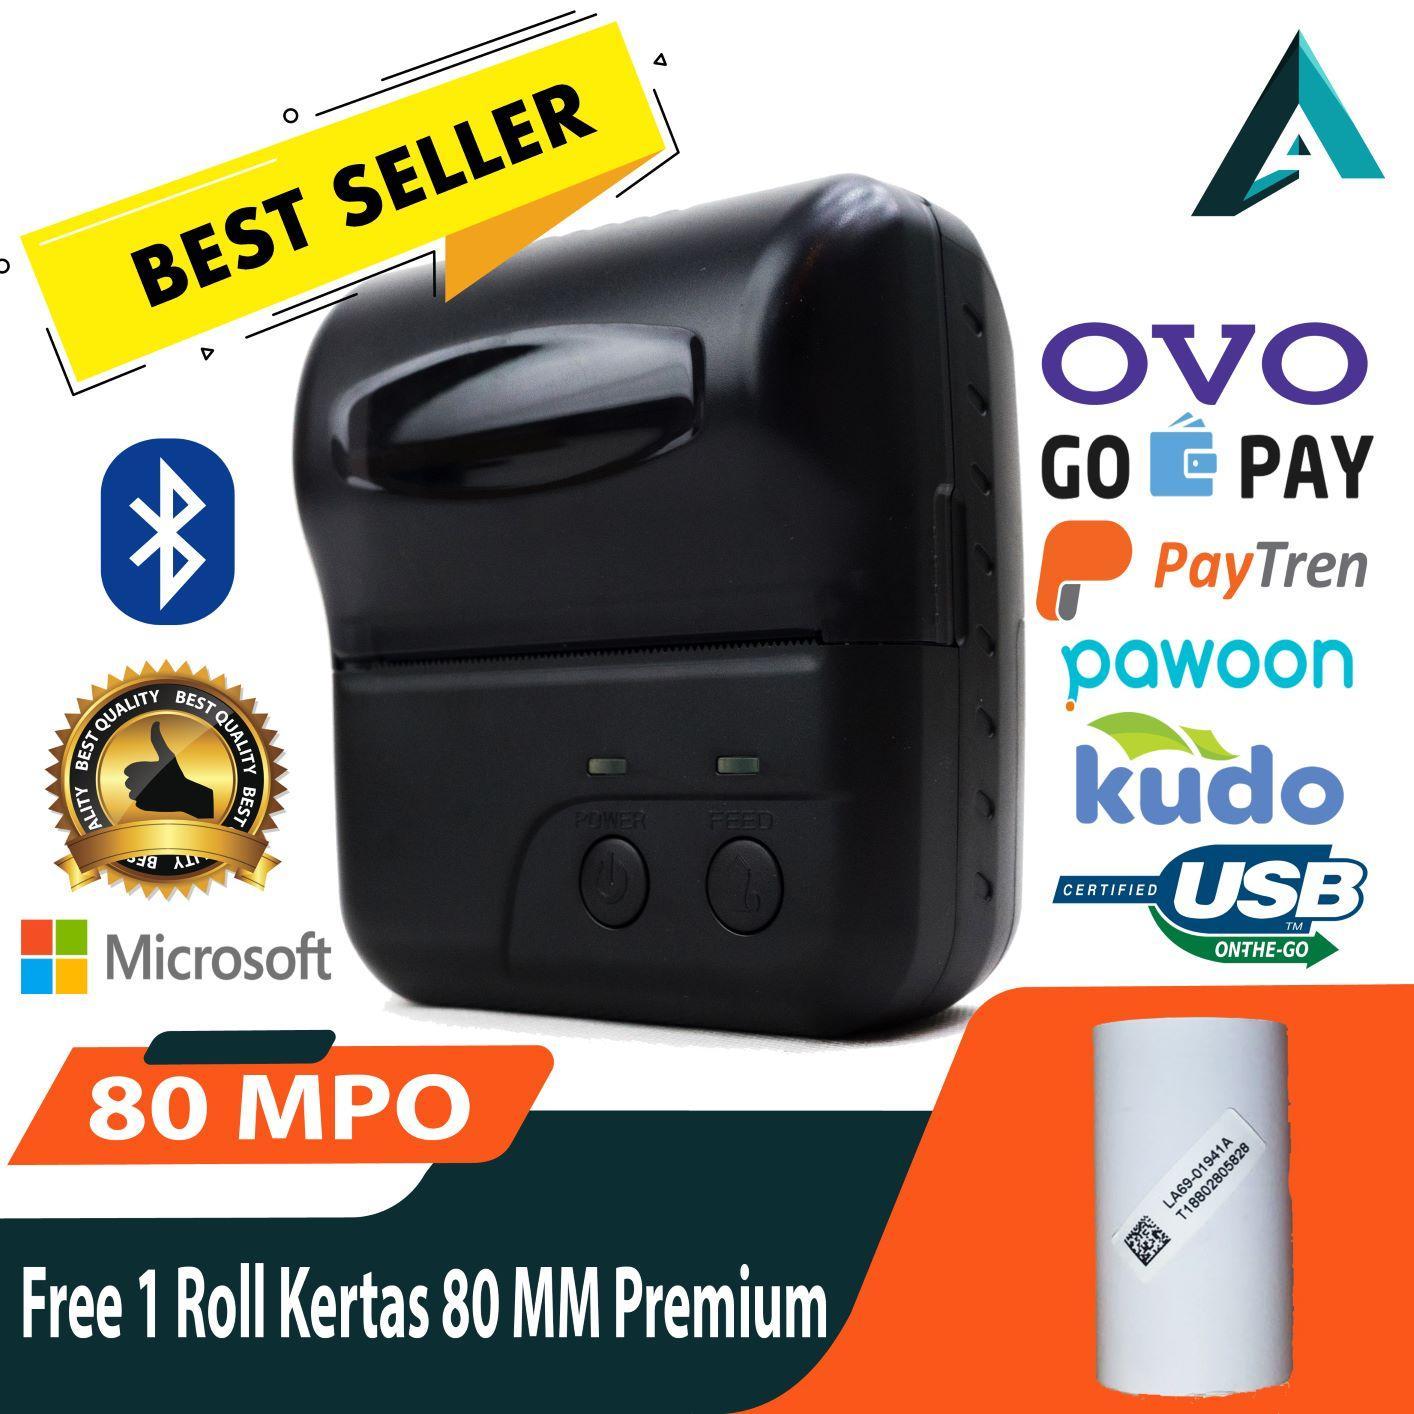 https://www.lazada.co.id/products/printer-bluetooth-80-mm-bluetooth-thermal-iware-free-1-roll-kertas-80mm-premium-i507300460-s661118098.html